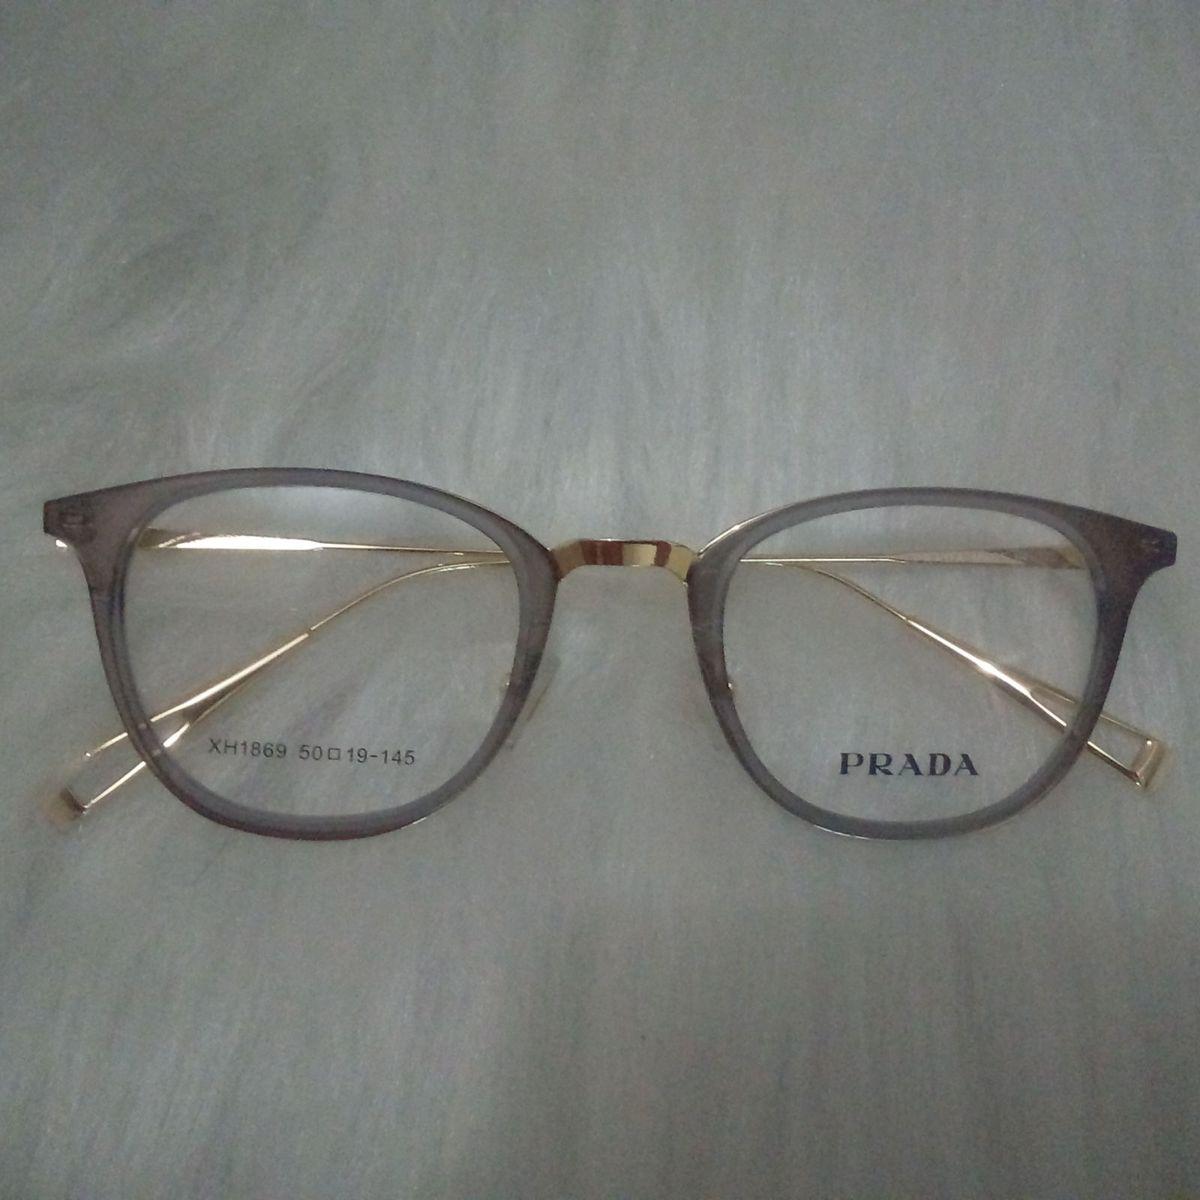 armaçao feminina acetato e metal - óculos prd.  Czm6ly9wag90b3muzw5qb2vplmnvbs5ici9wcm9kdwn0cy80mza2ny8yodninjdkyjgxy2flzdywnty5yzringnlztgznty2zc5qcgc  ... 41f60bc3e7